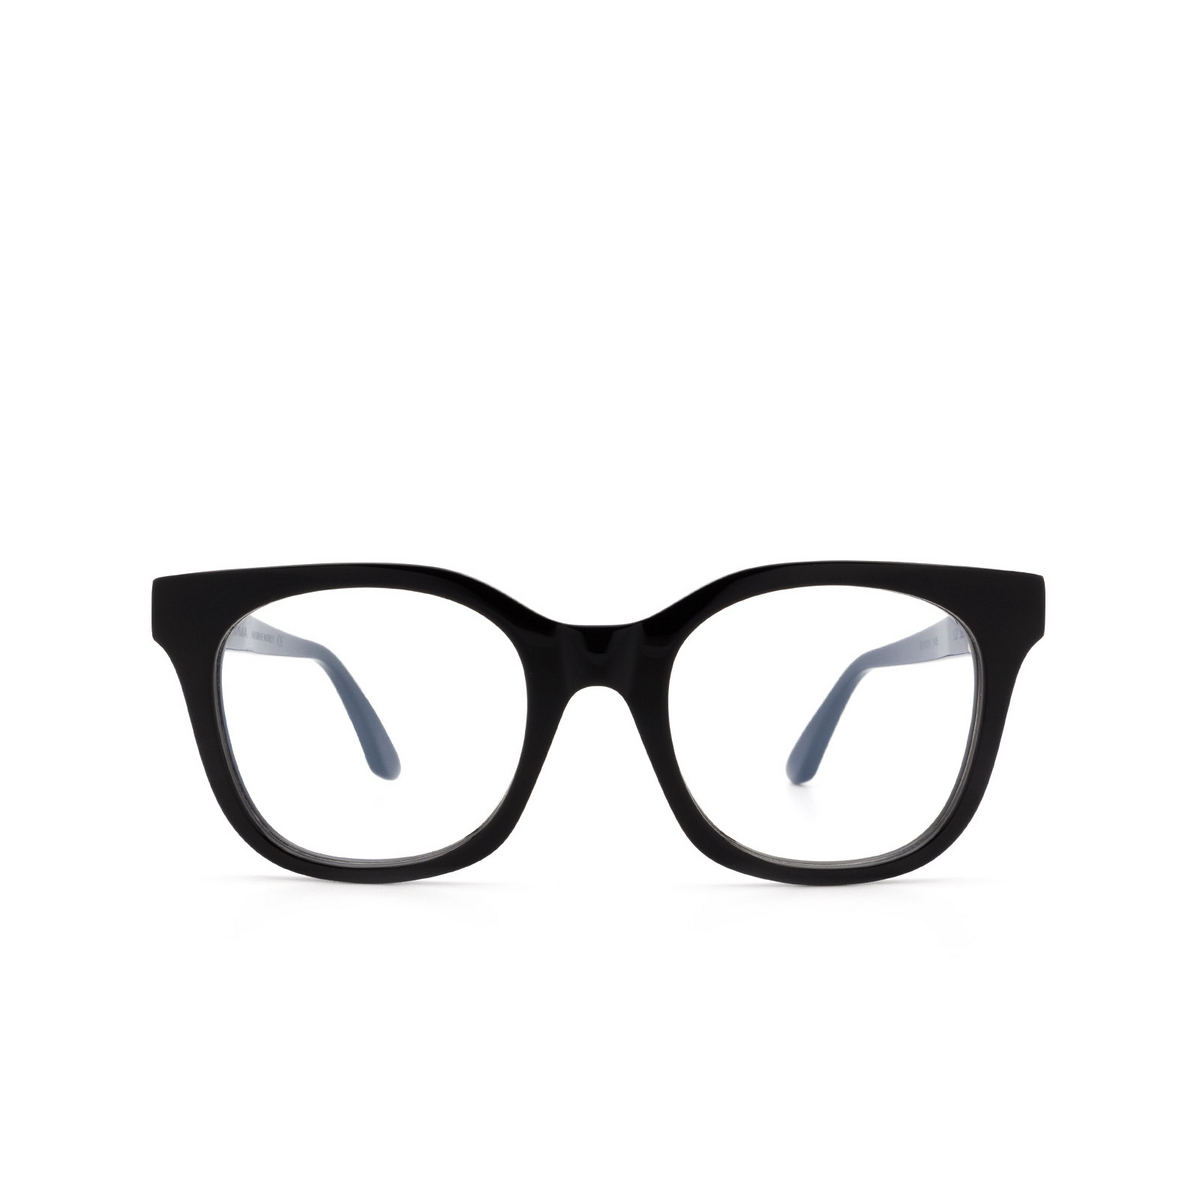 Huma® Square Eyeglasses: Liz color Black 06V - front view.